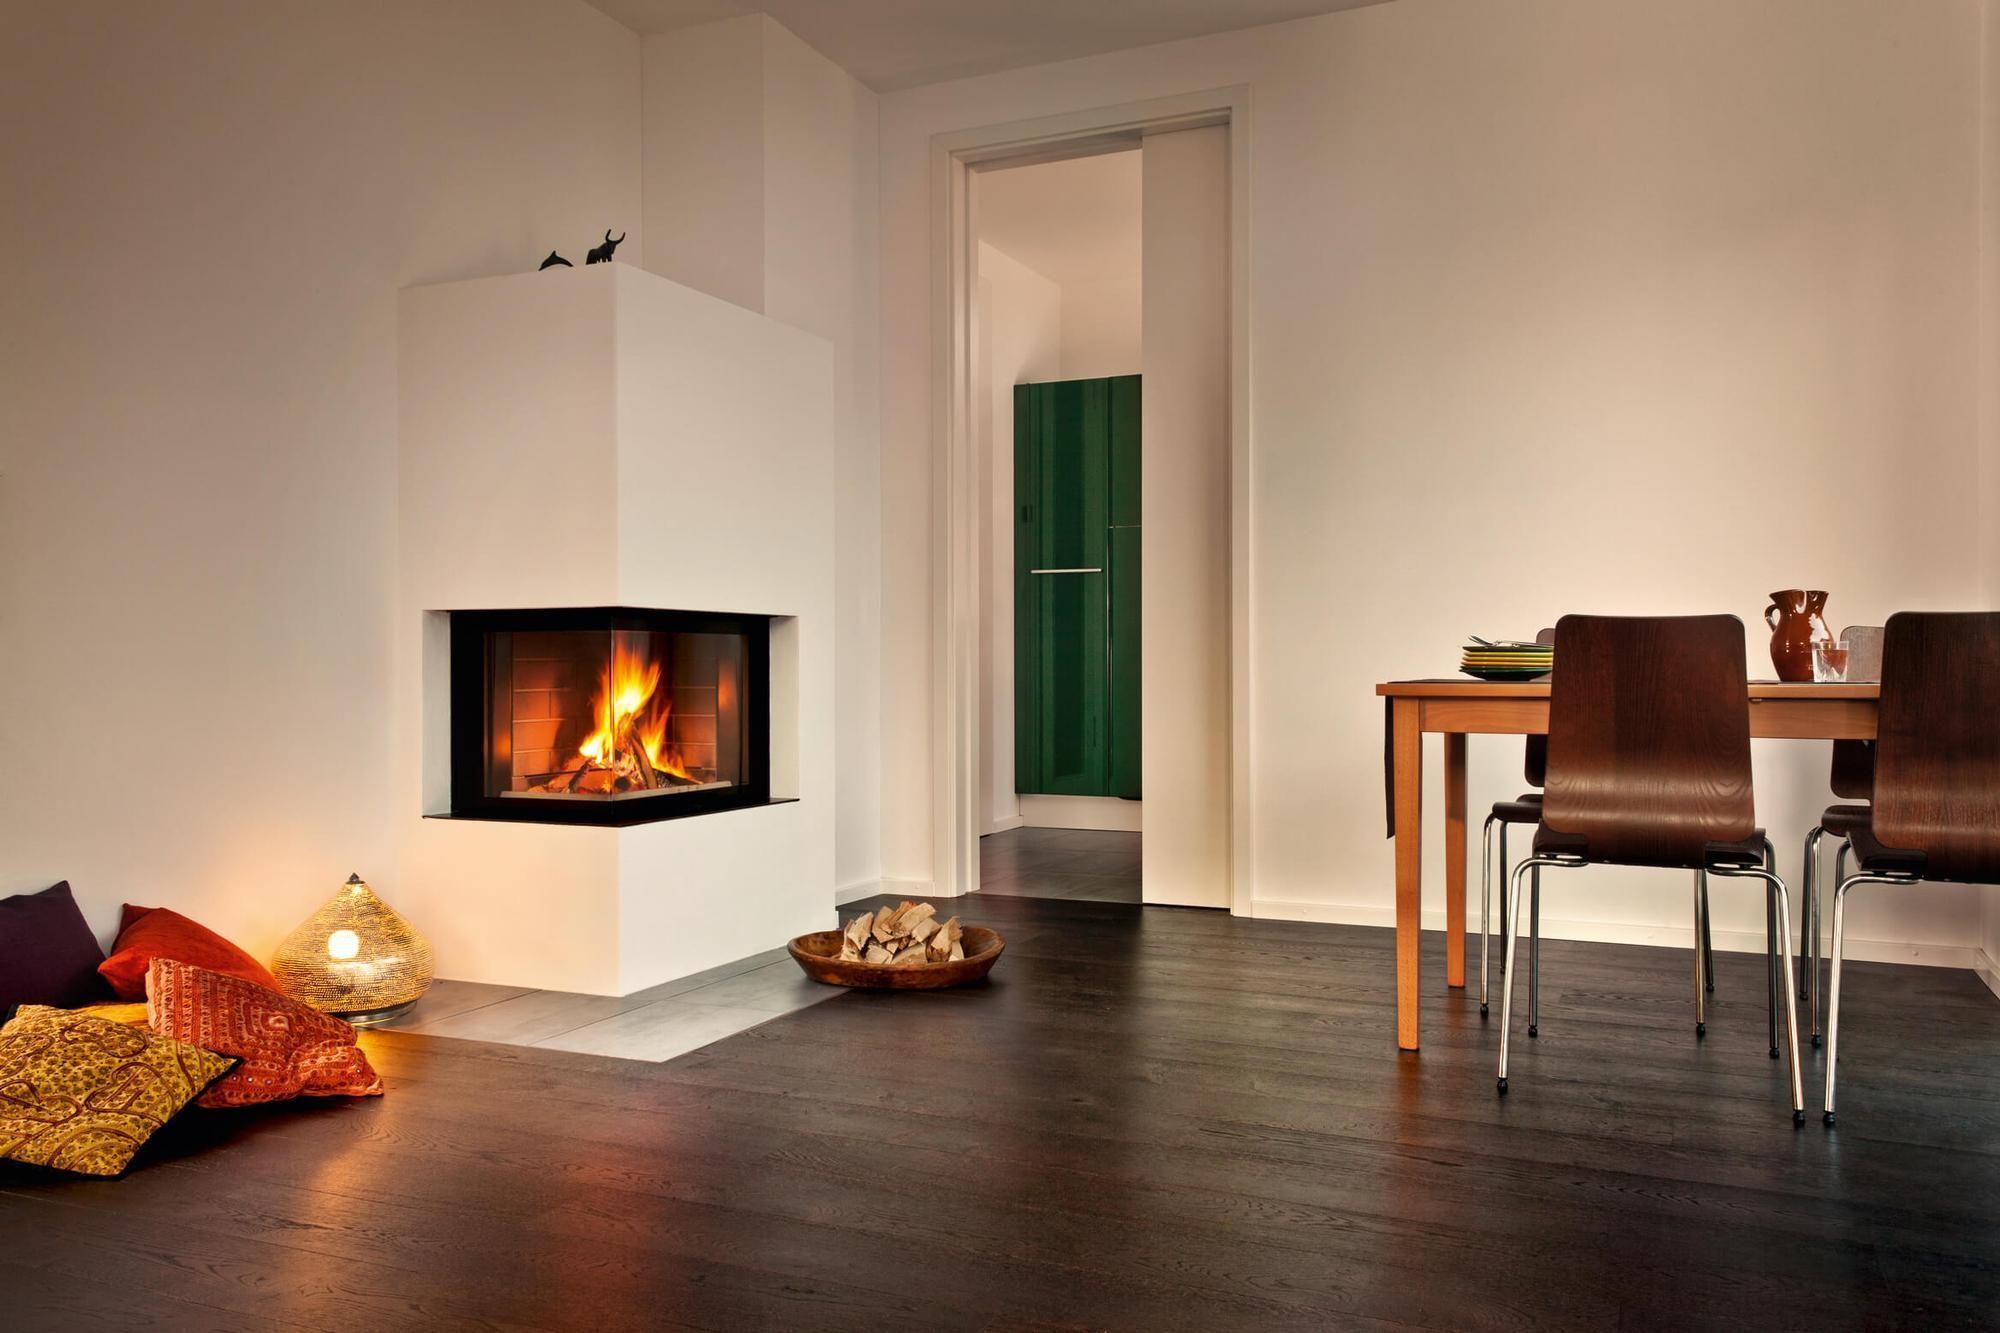 Fireplaces - Cheminée / Kamin / Ofen